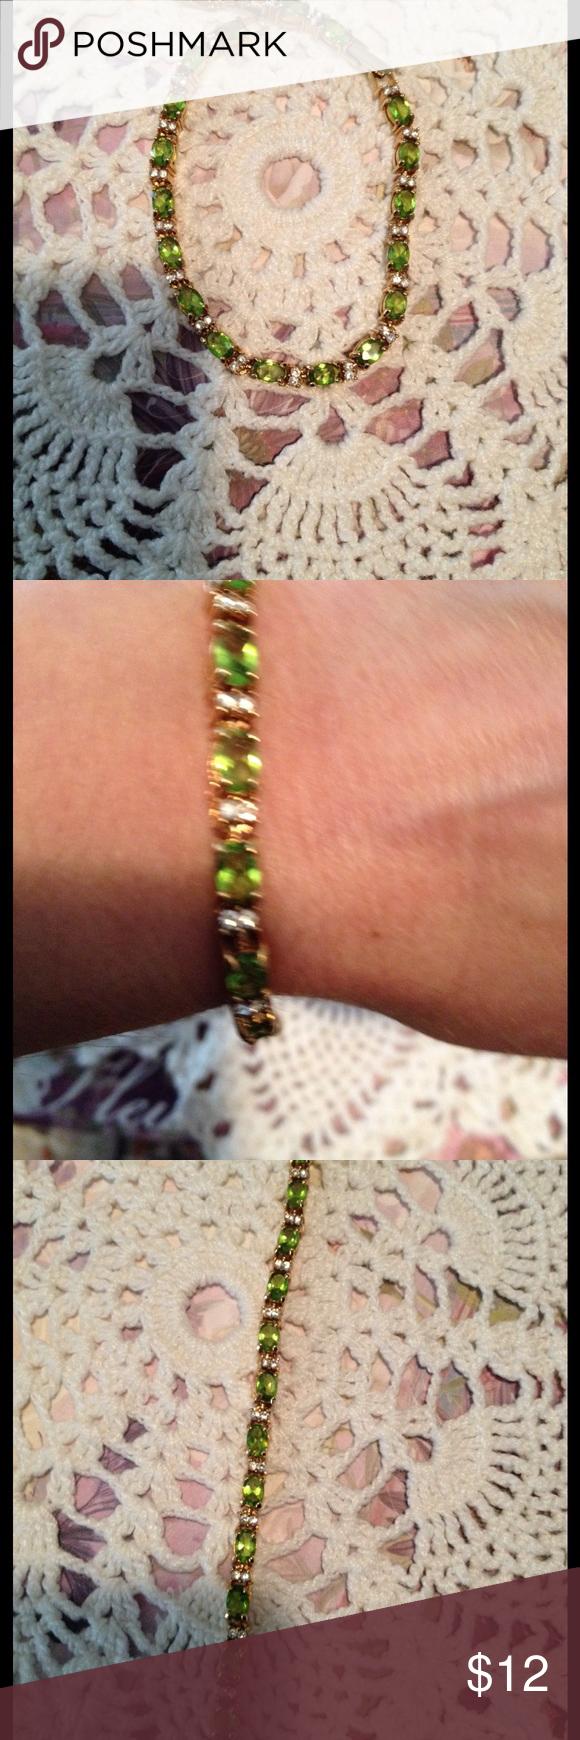 Avon birthstone bracelet avon gold tone birthstone tennis bracelet